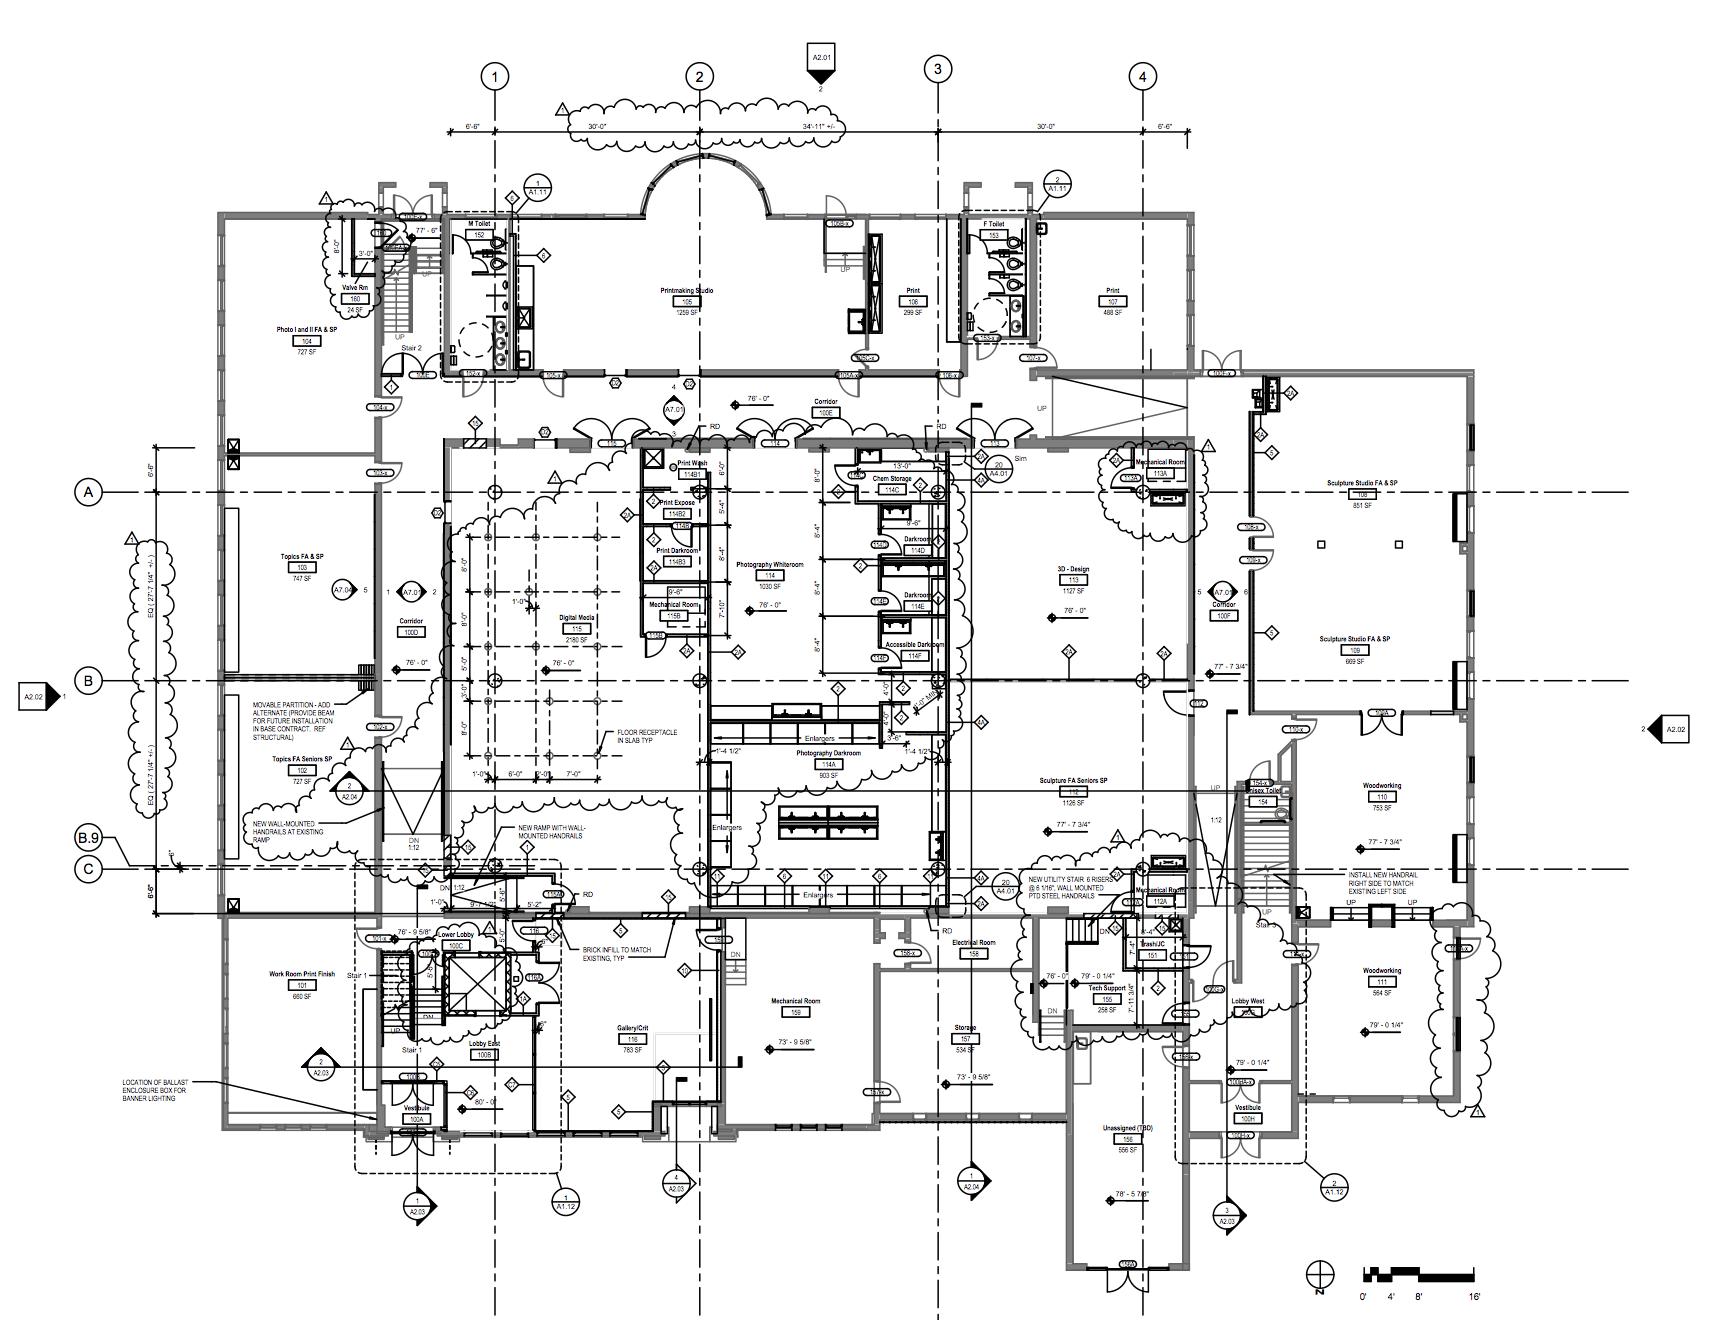 School Building Blueprints Interactive 497412 Building Blueprints Blueprints Elegant Building Blueprintsin On Printable Buildings Blueprints